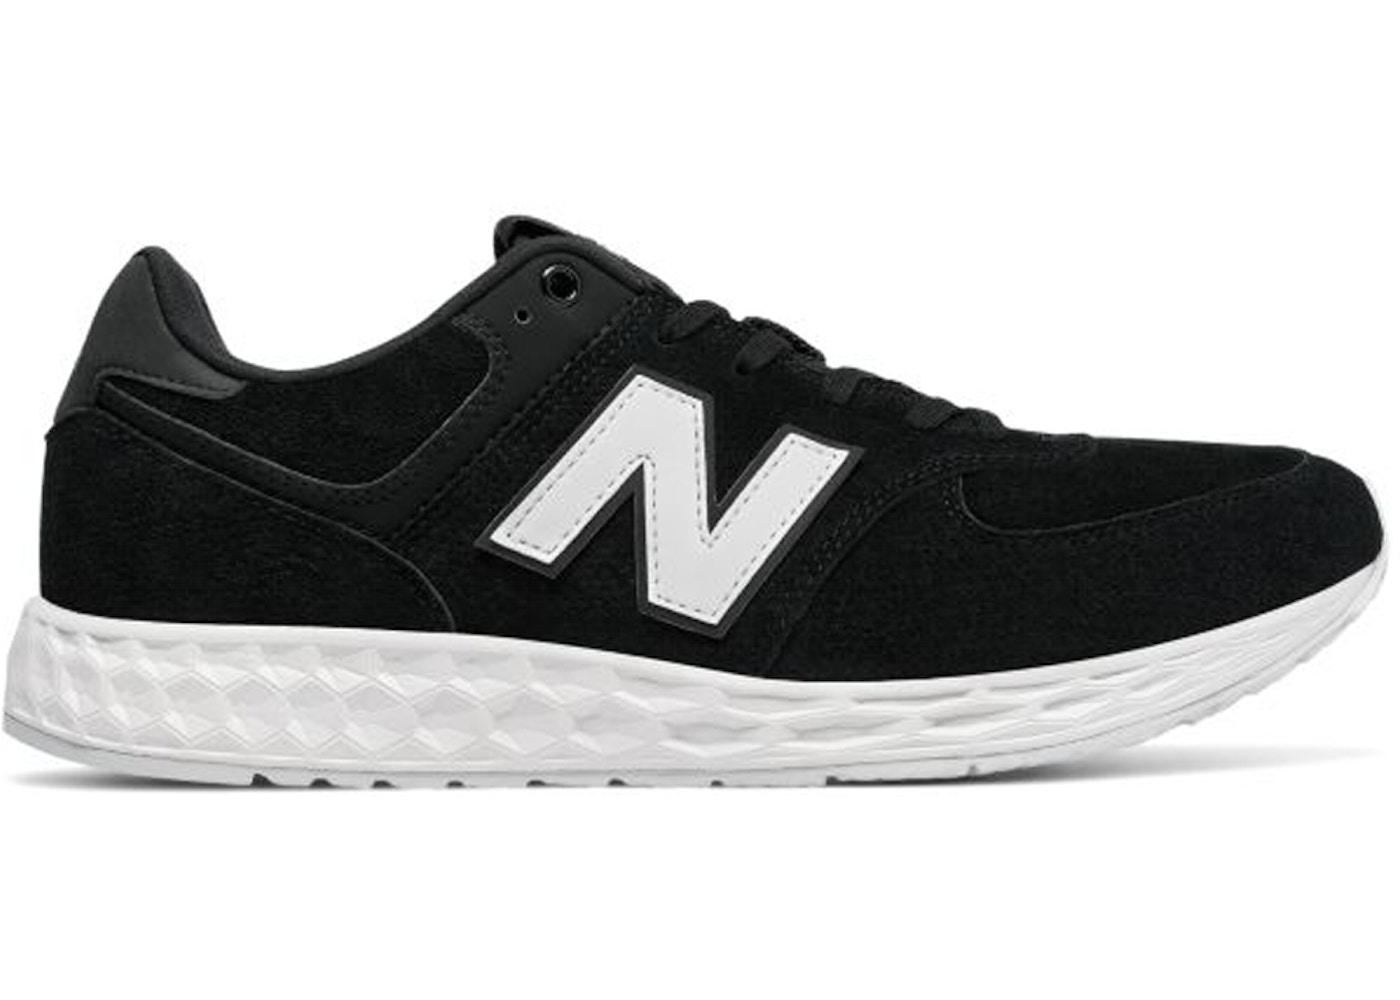 new product a0395 3b17e New Balance 574 Fresh Foam Suede Black White